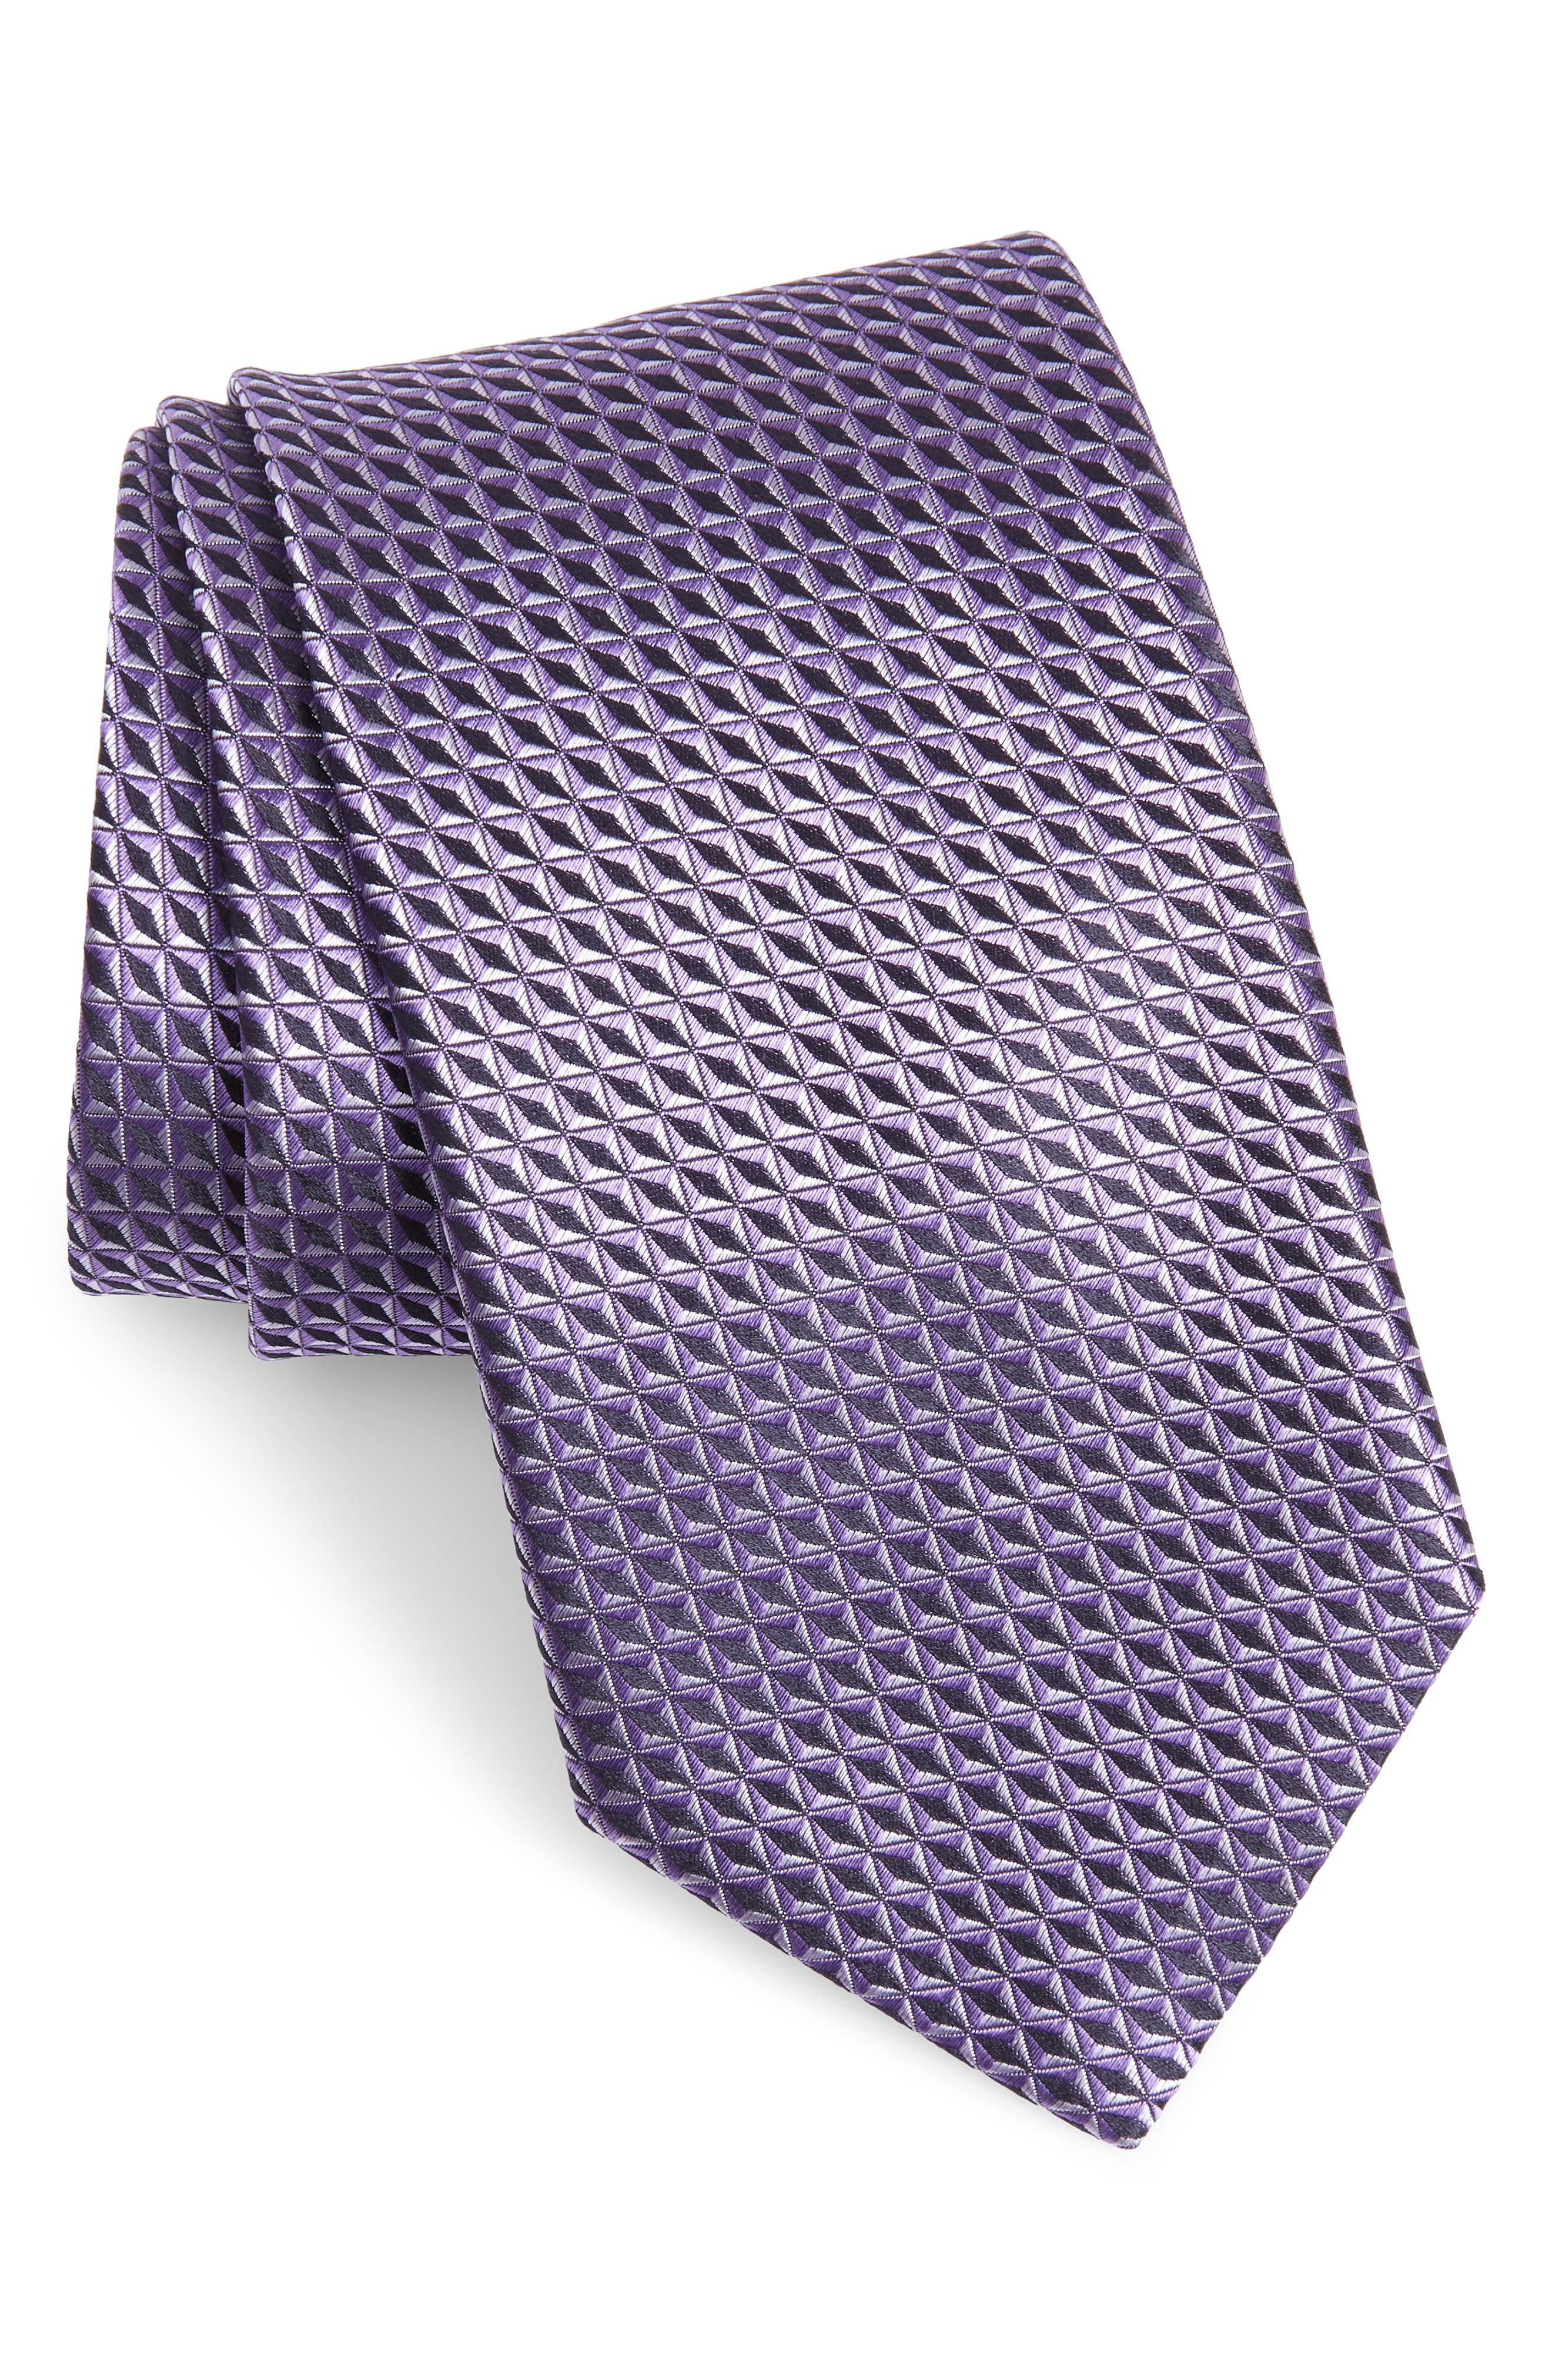 CANALI, Geometric Silk X-Long Tie, Main thumbnail 1, color, LIGHT PURPLE